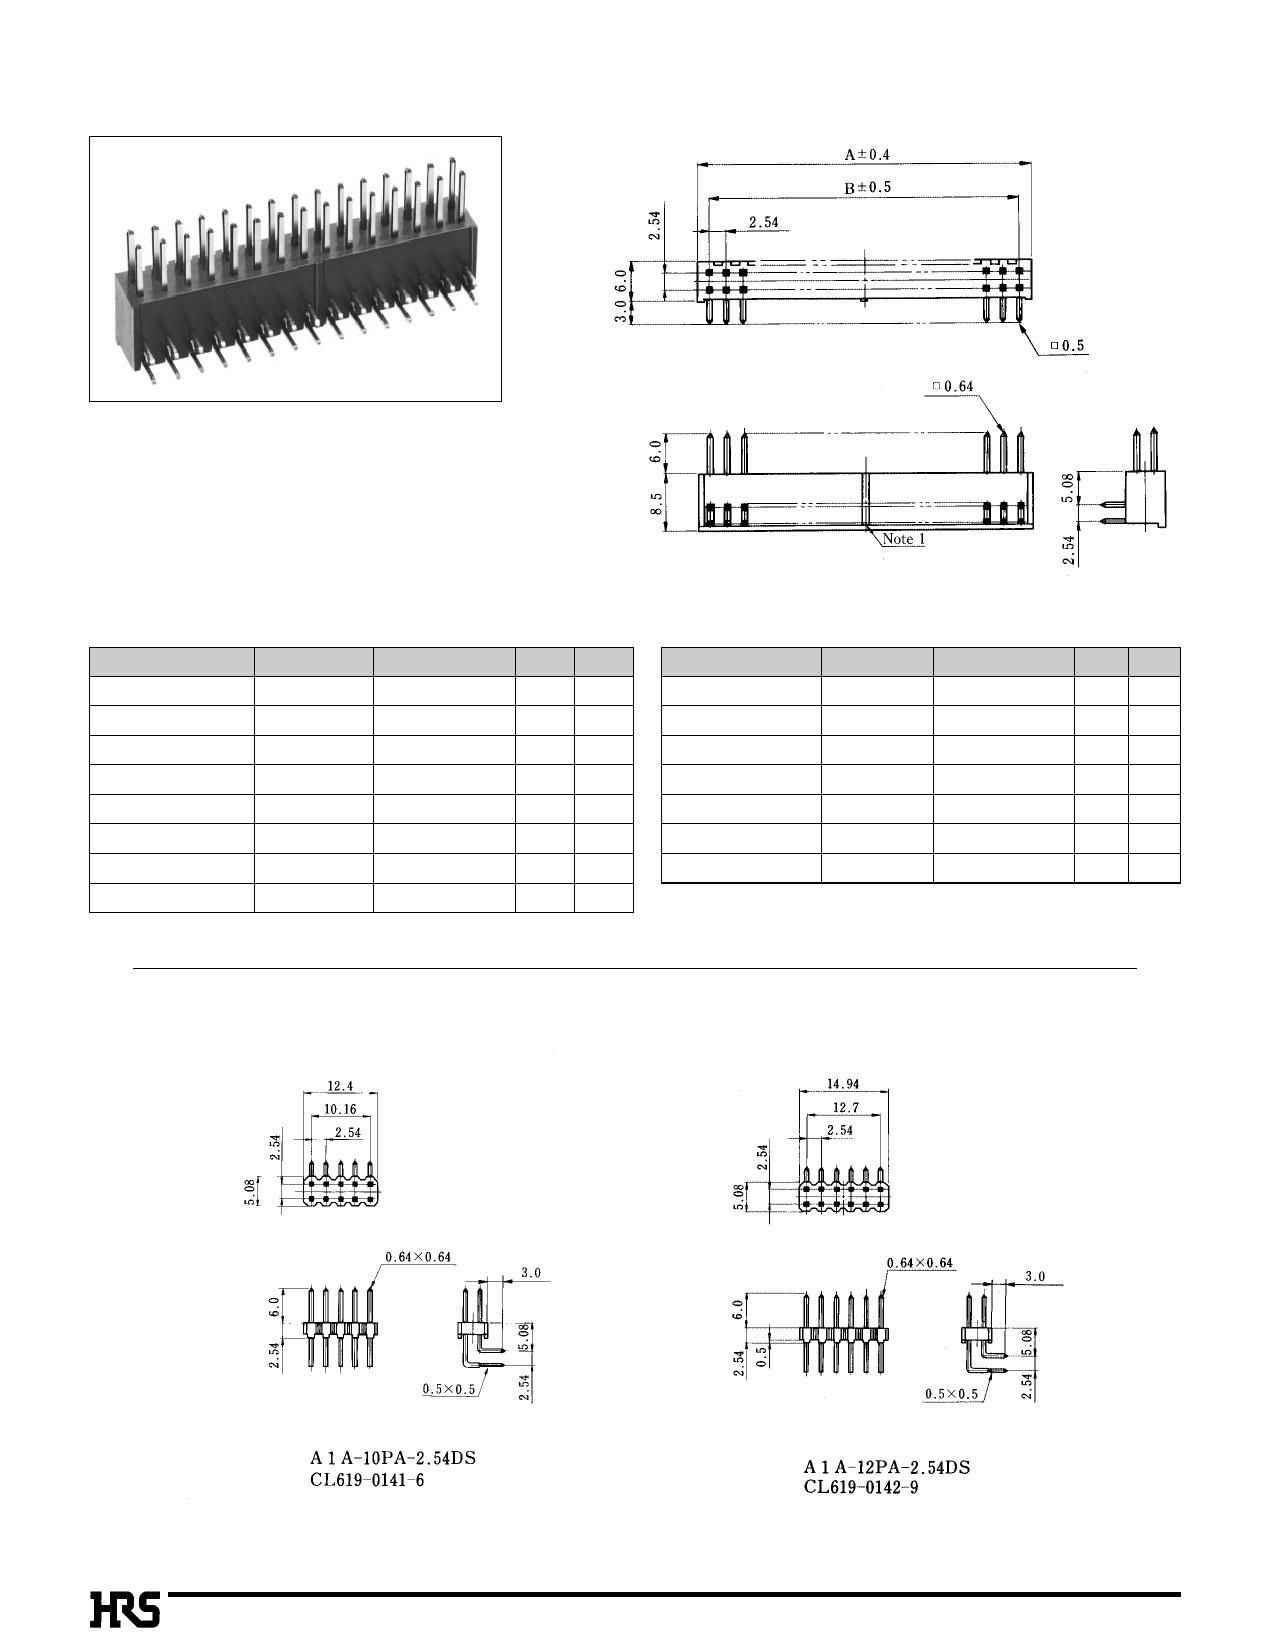 A2-11PA-2.54DS pdf, ピン配列